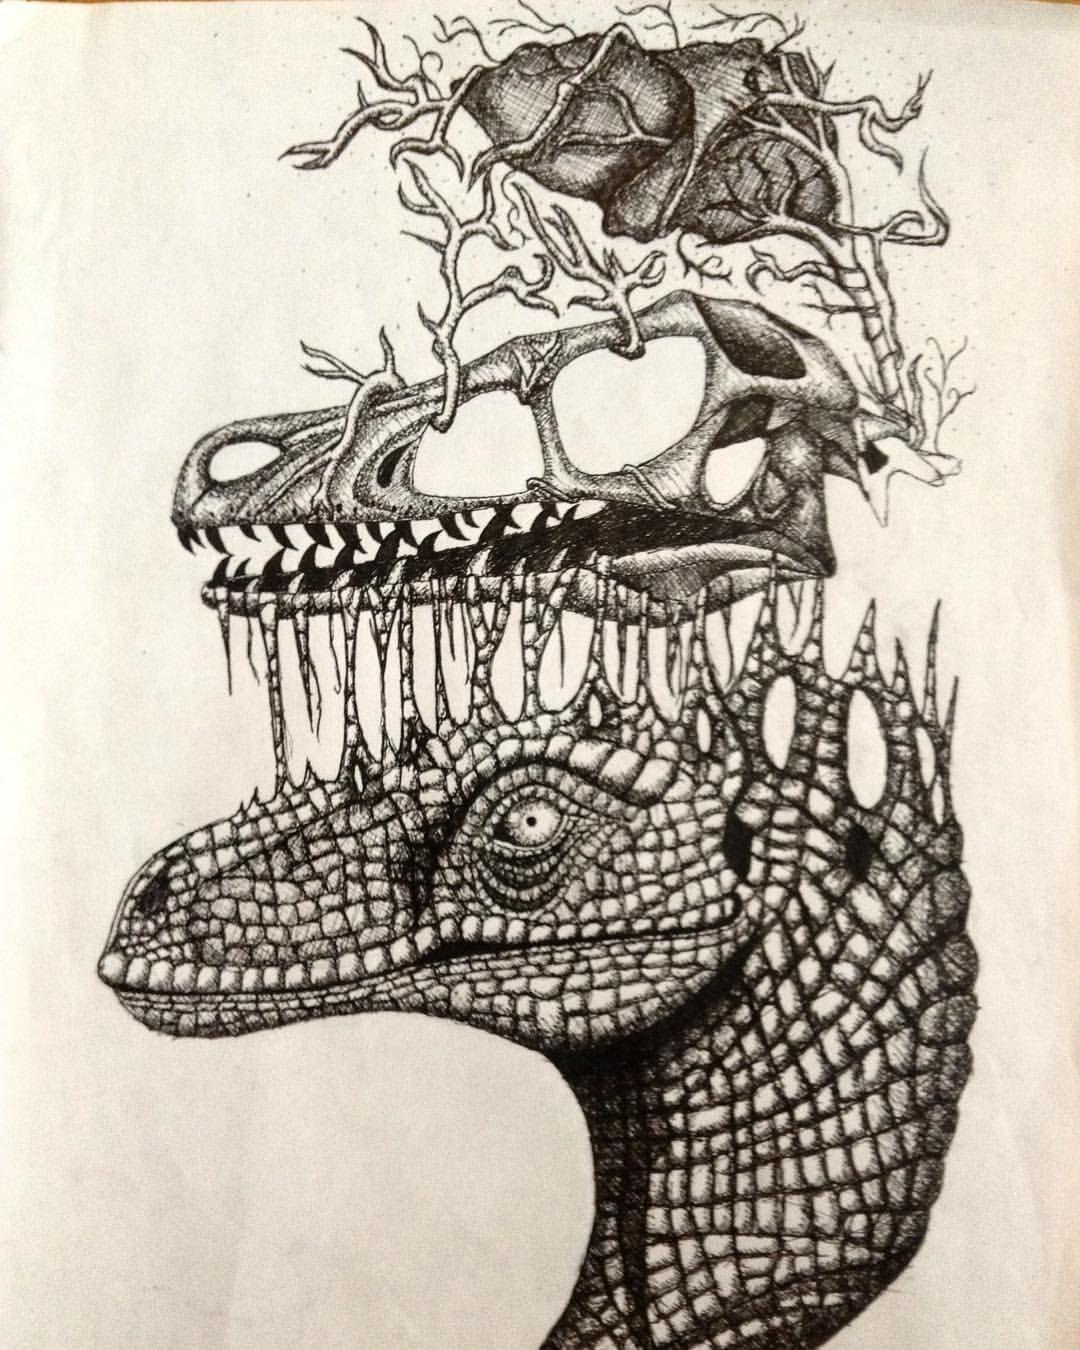 velociraptor drawing colored